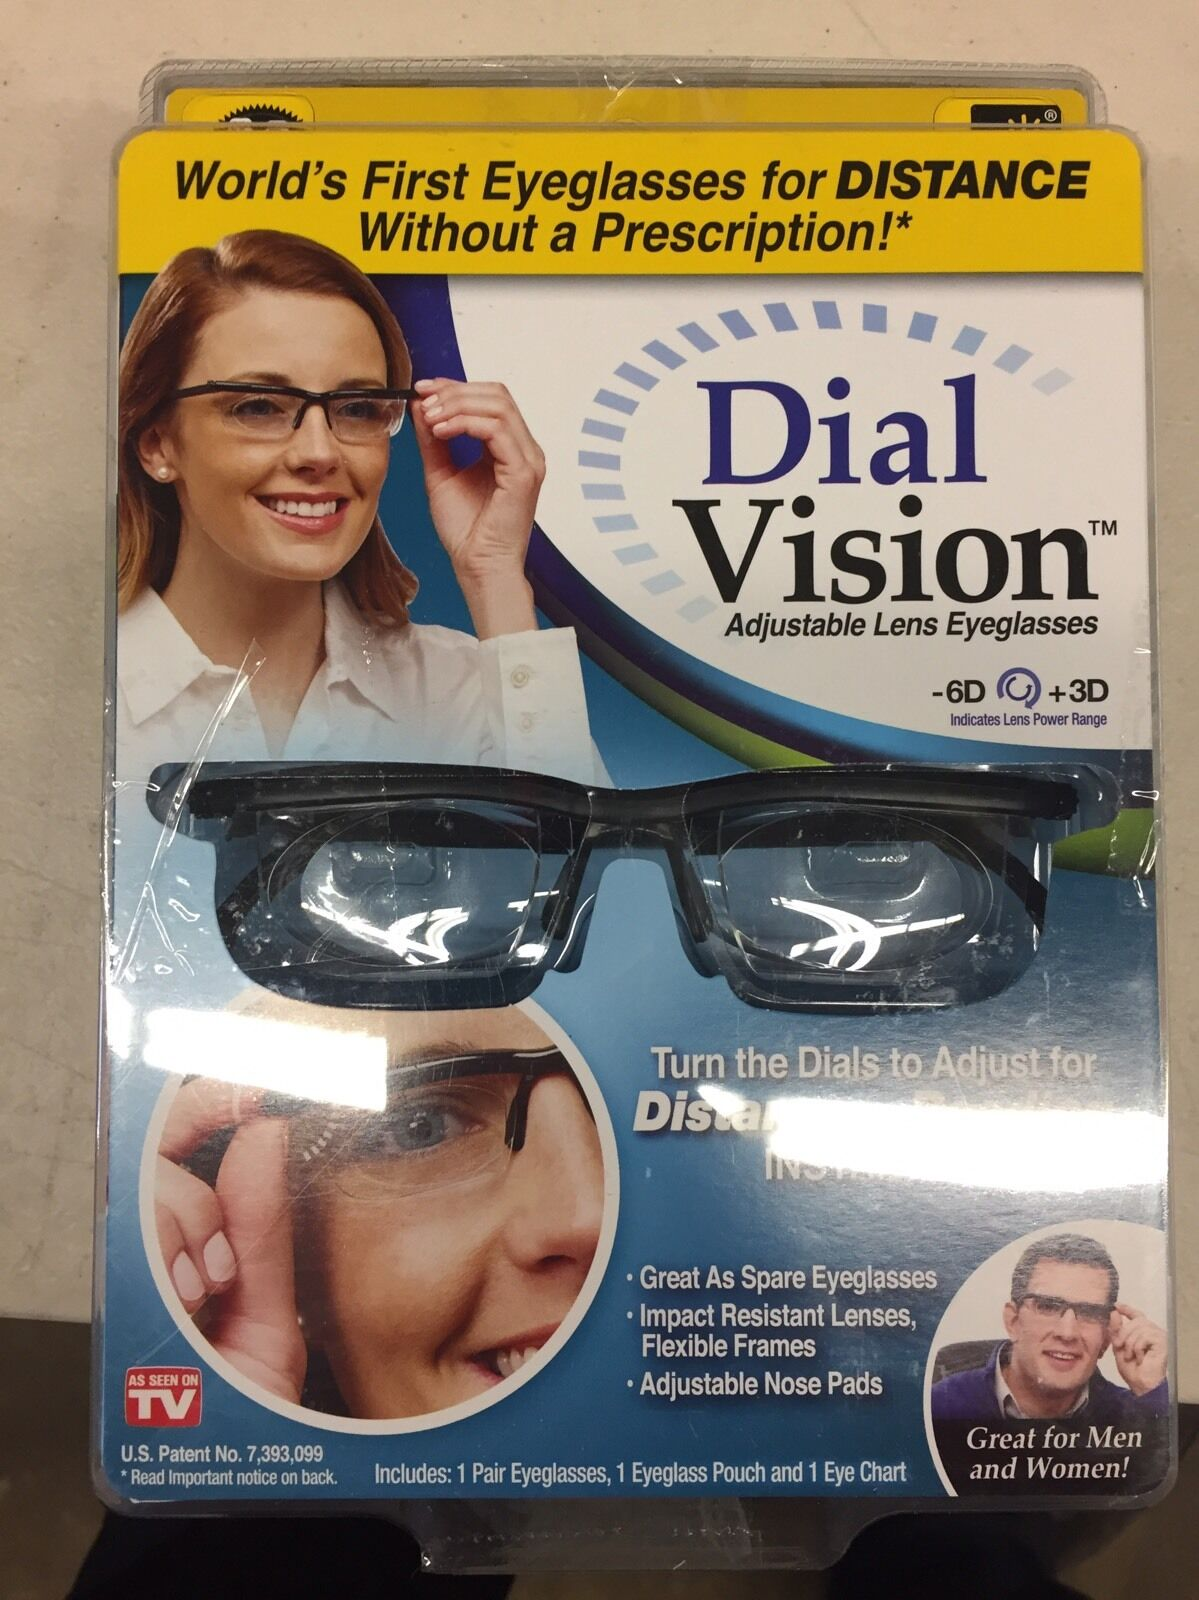 7517f224c9 Instant Adjustable Lens Vision Glasses as Seen on TV in Case for sale  online